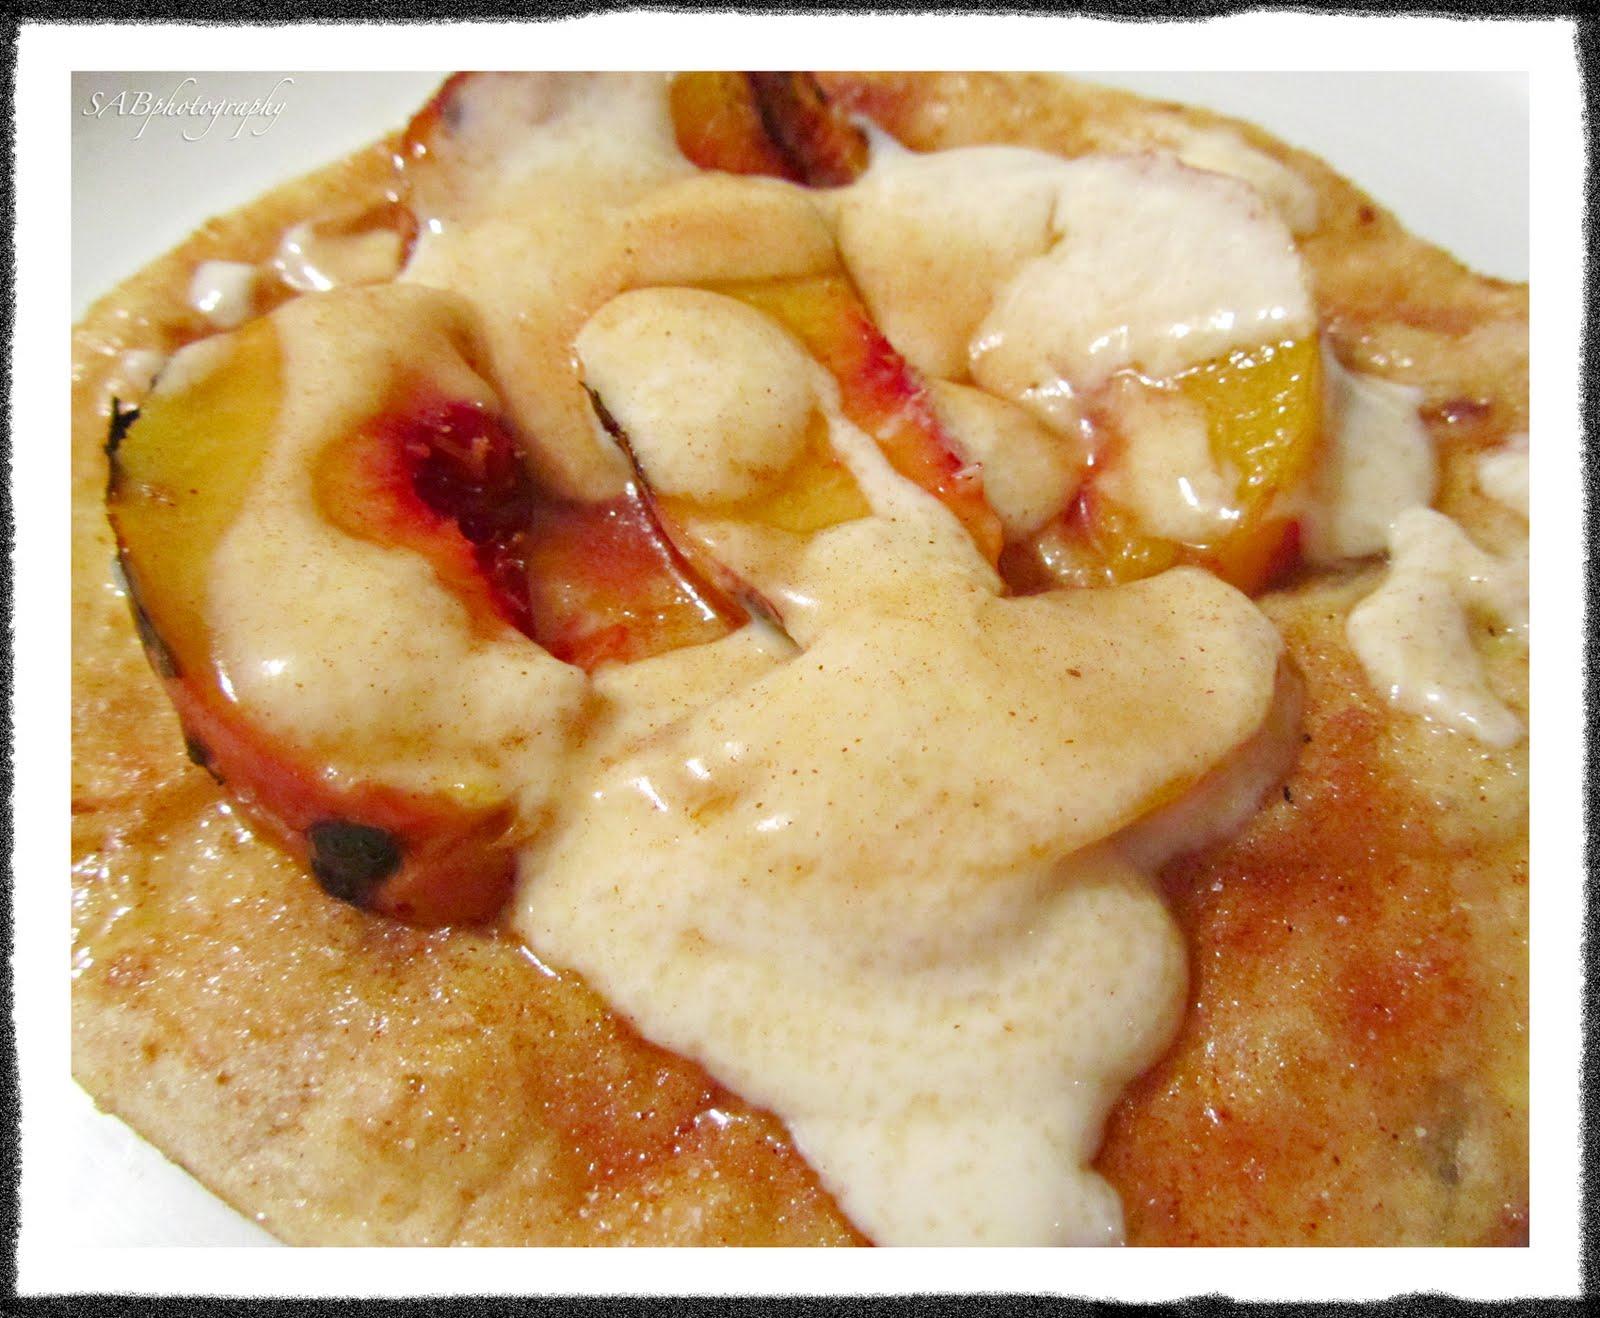 Grilled Peaches w/ Cinnamon-Sugar Tortillas & Sweetened Sour Cream~